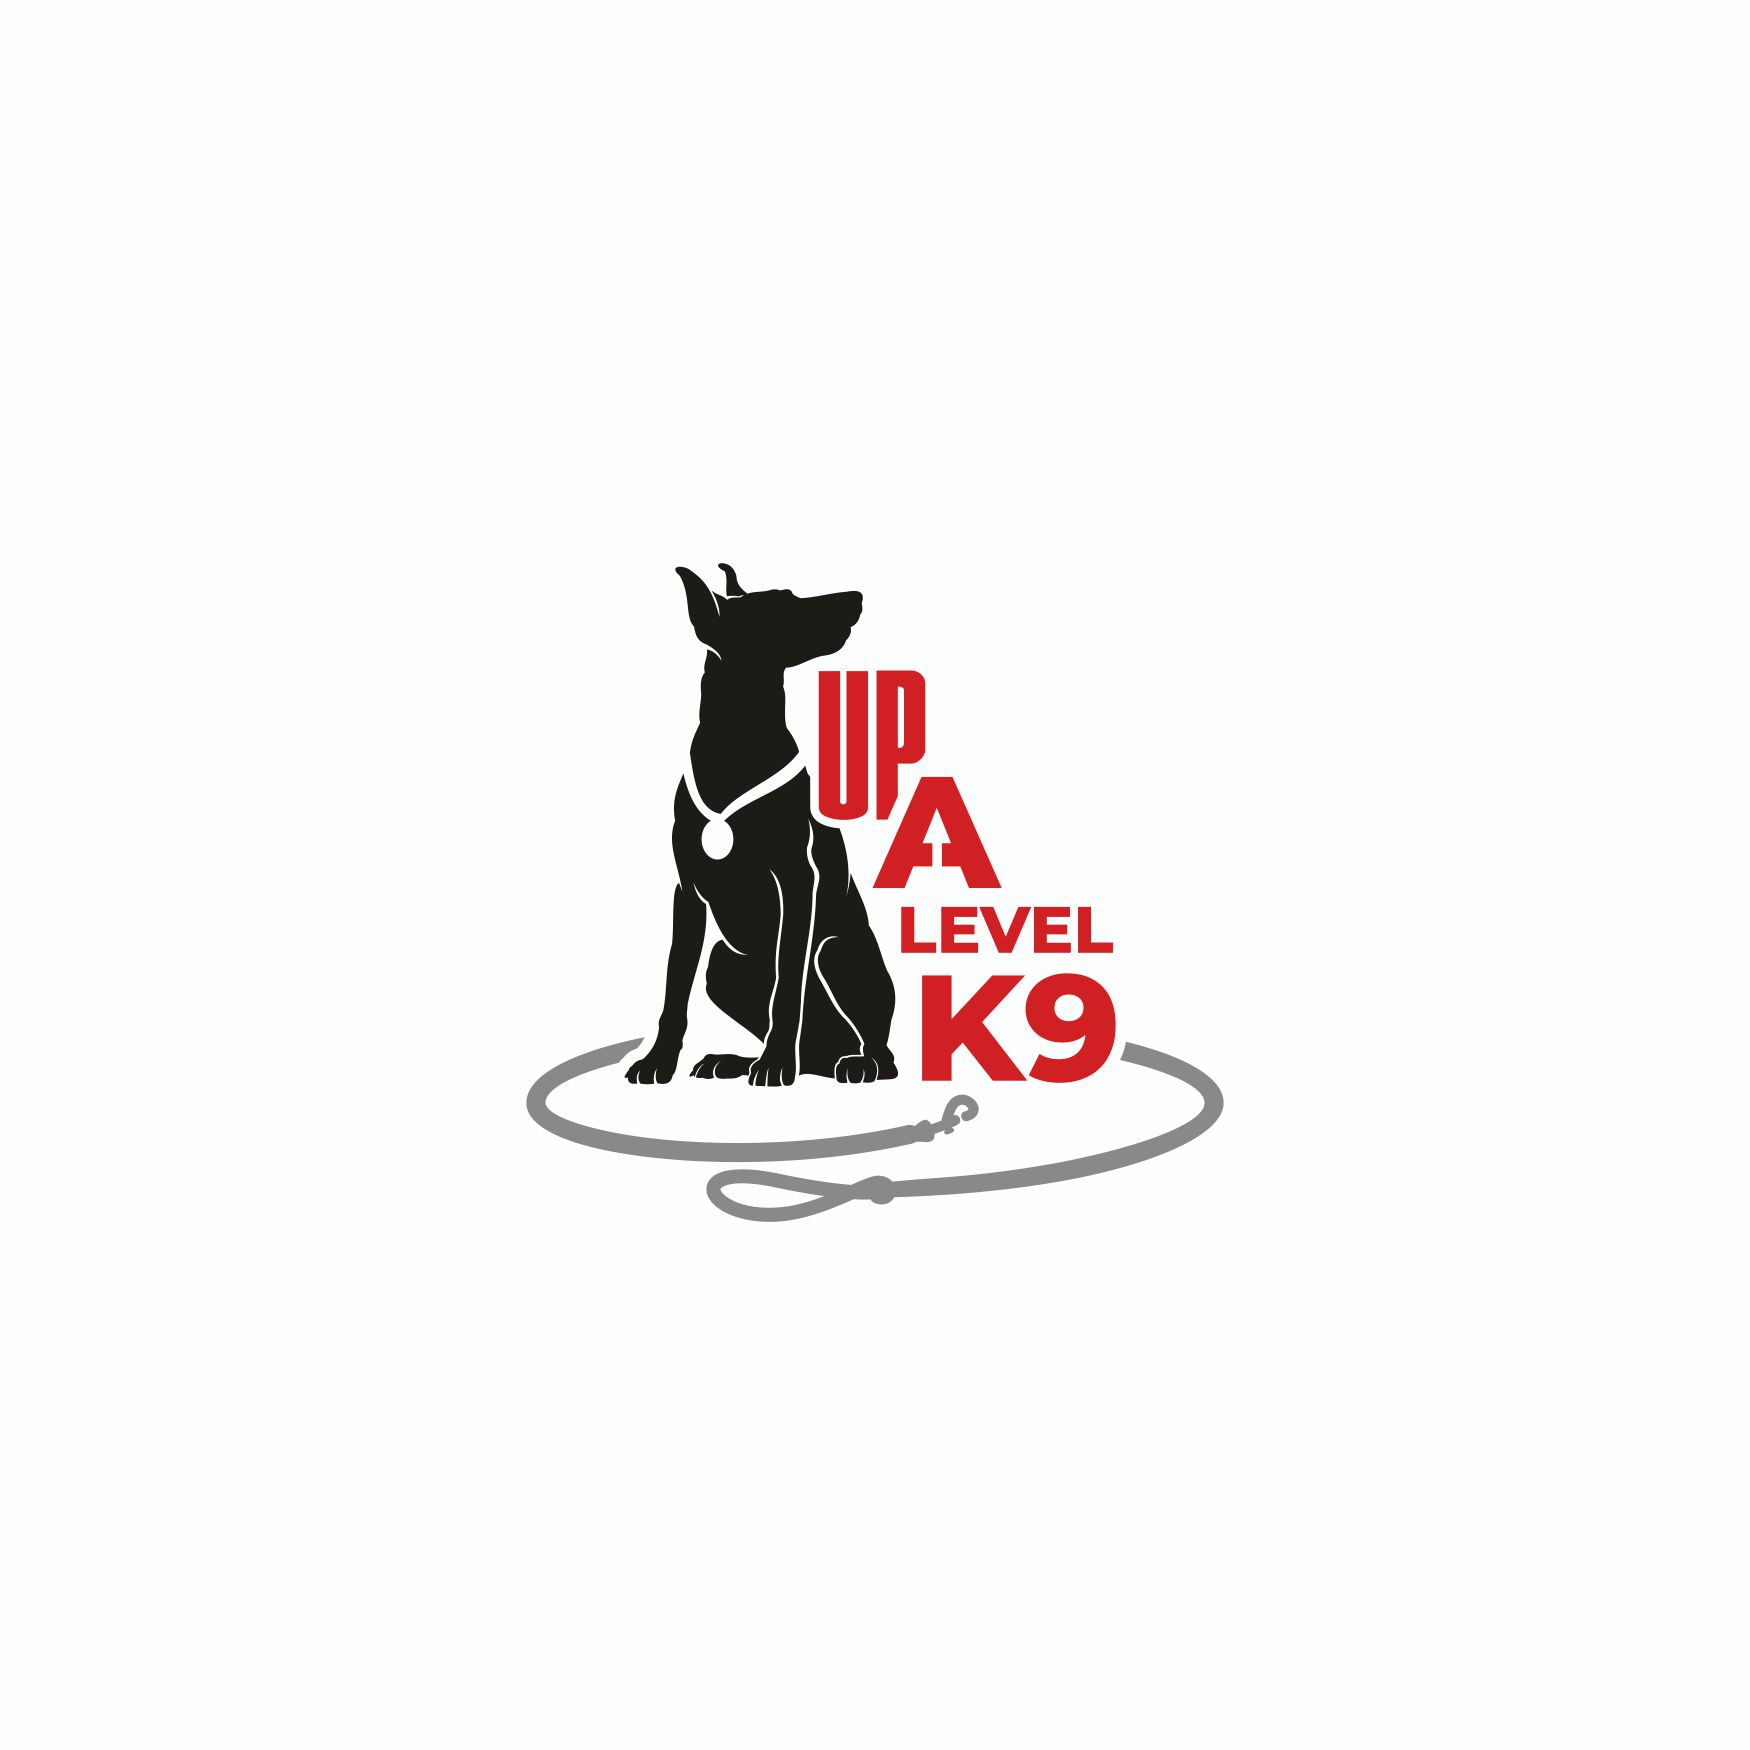 Alaska girl seeks logo for dog training business!